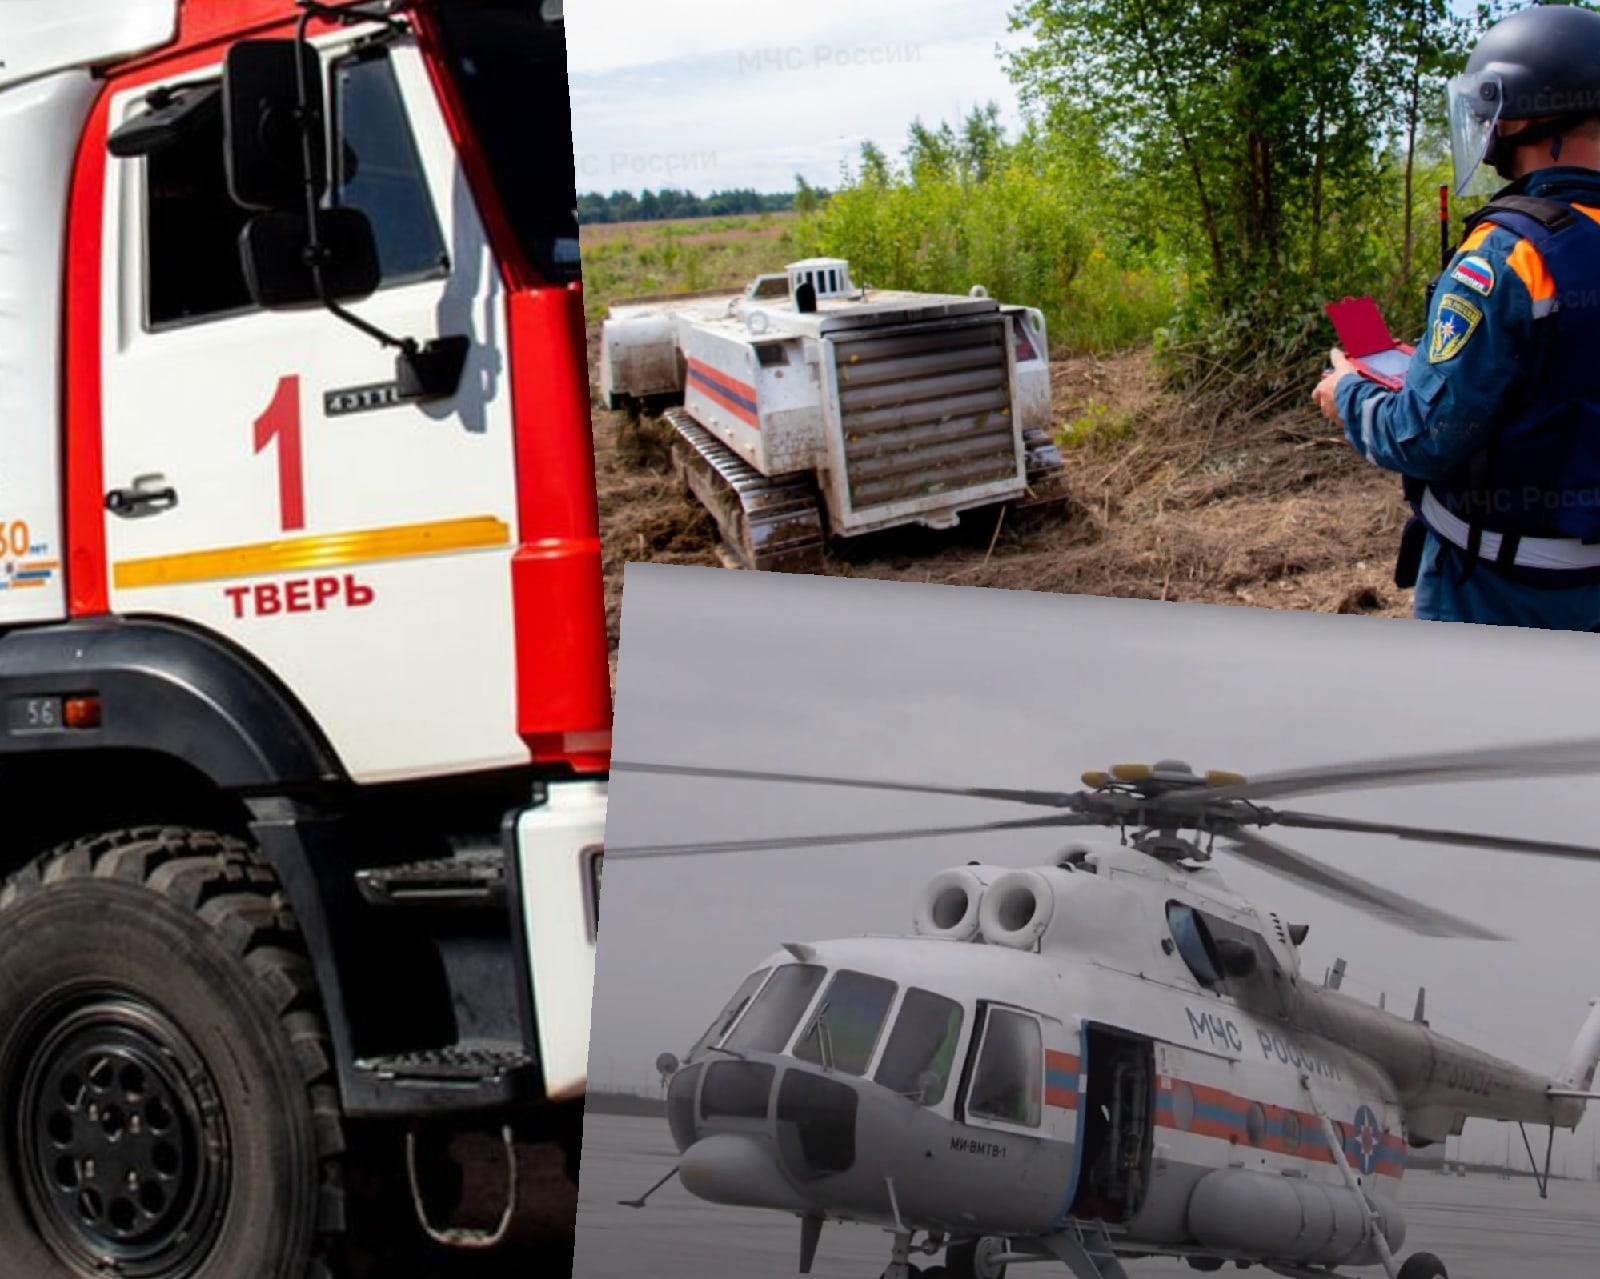 Техника спасения: ТОП-5 видео про арсенал МЧС в Тверской области